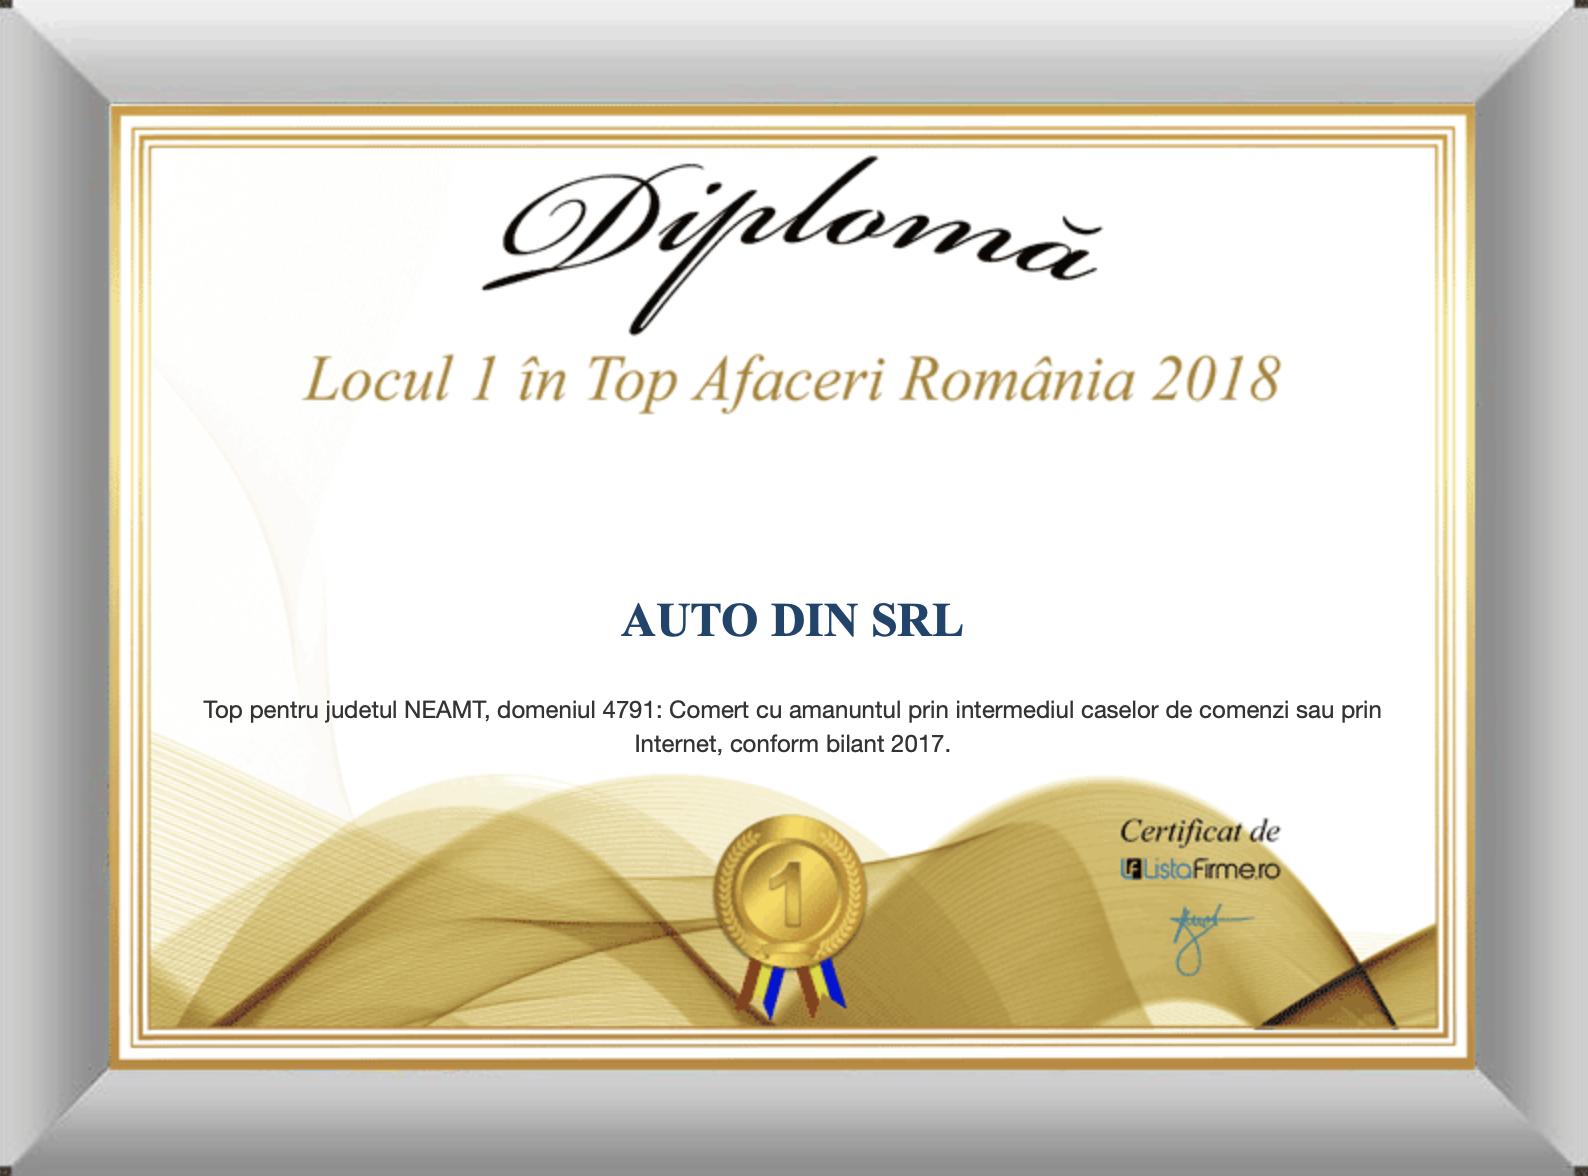 DiplomaAutoDin2018-1